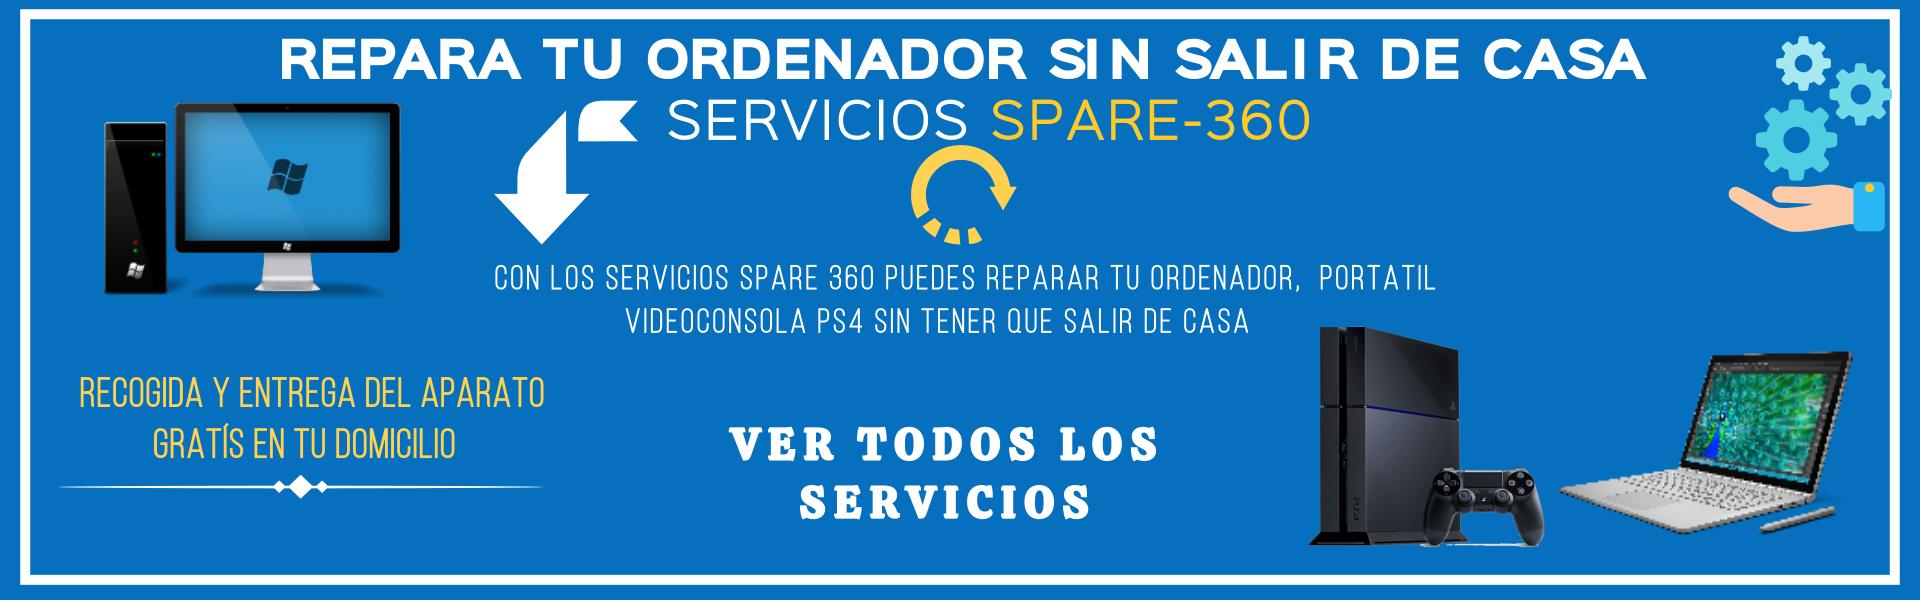 SERVICIOS SPARE 360